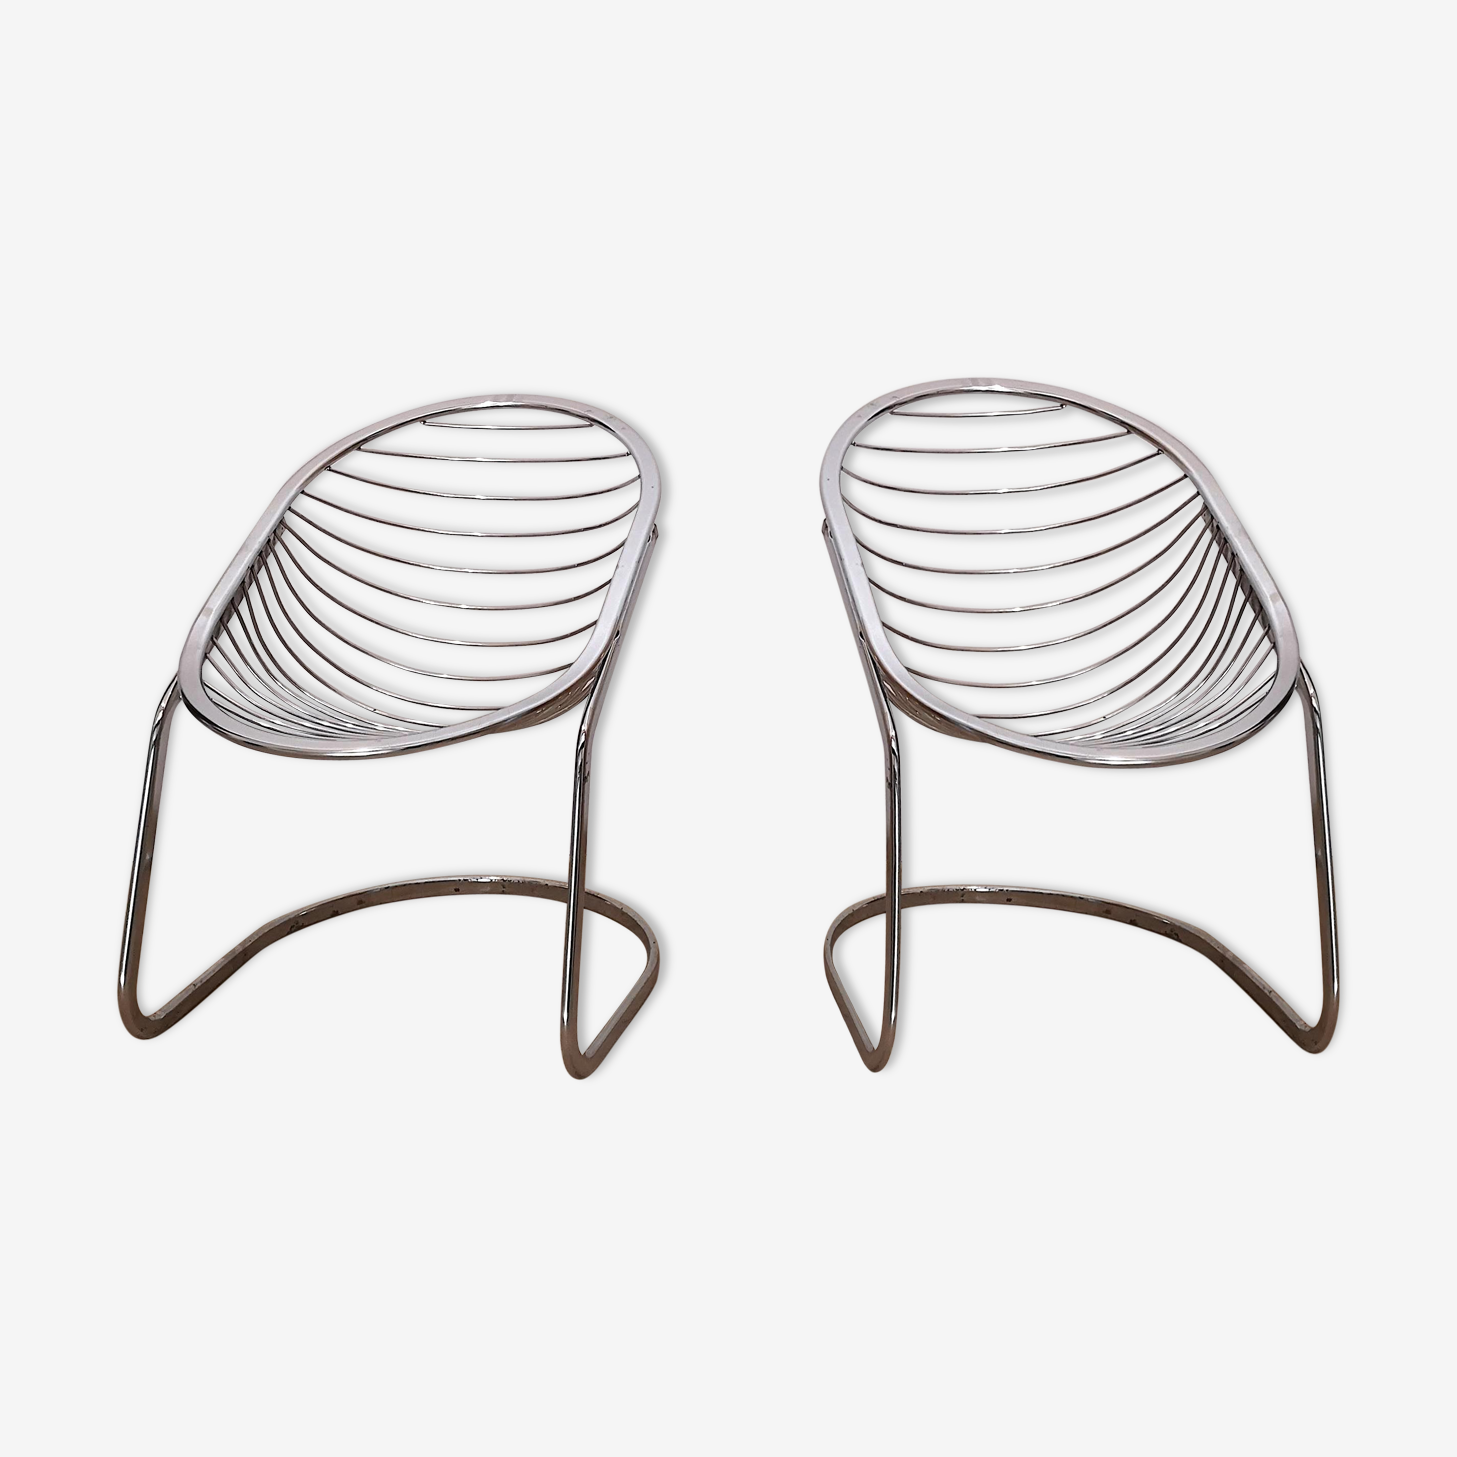 Details on pair of armchairs chrome vintage Gastone Rinaldi, 1970